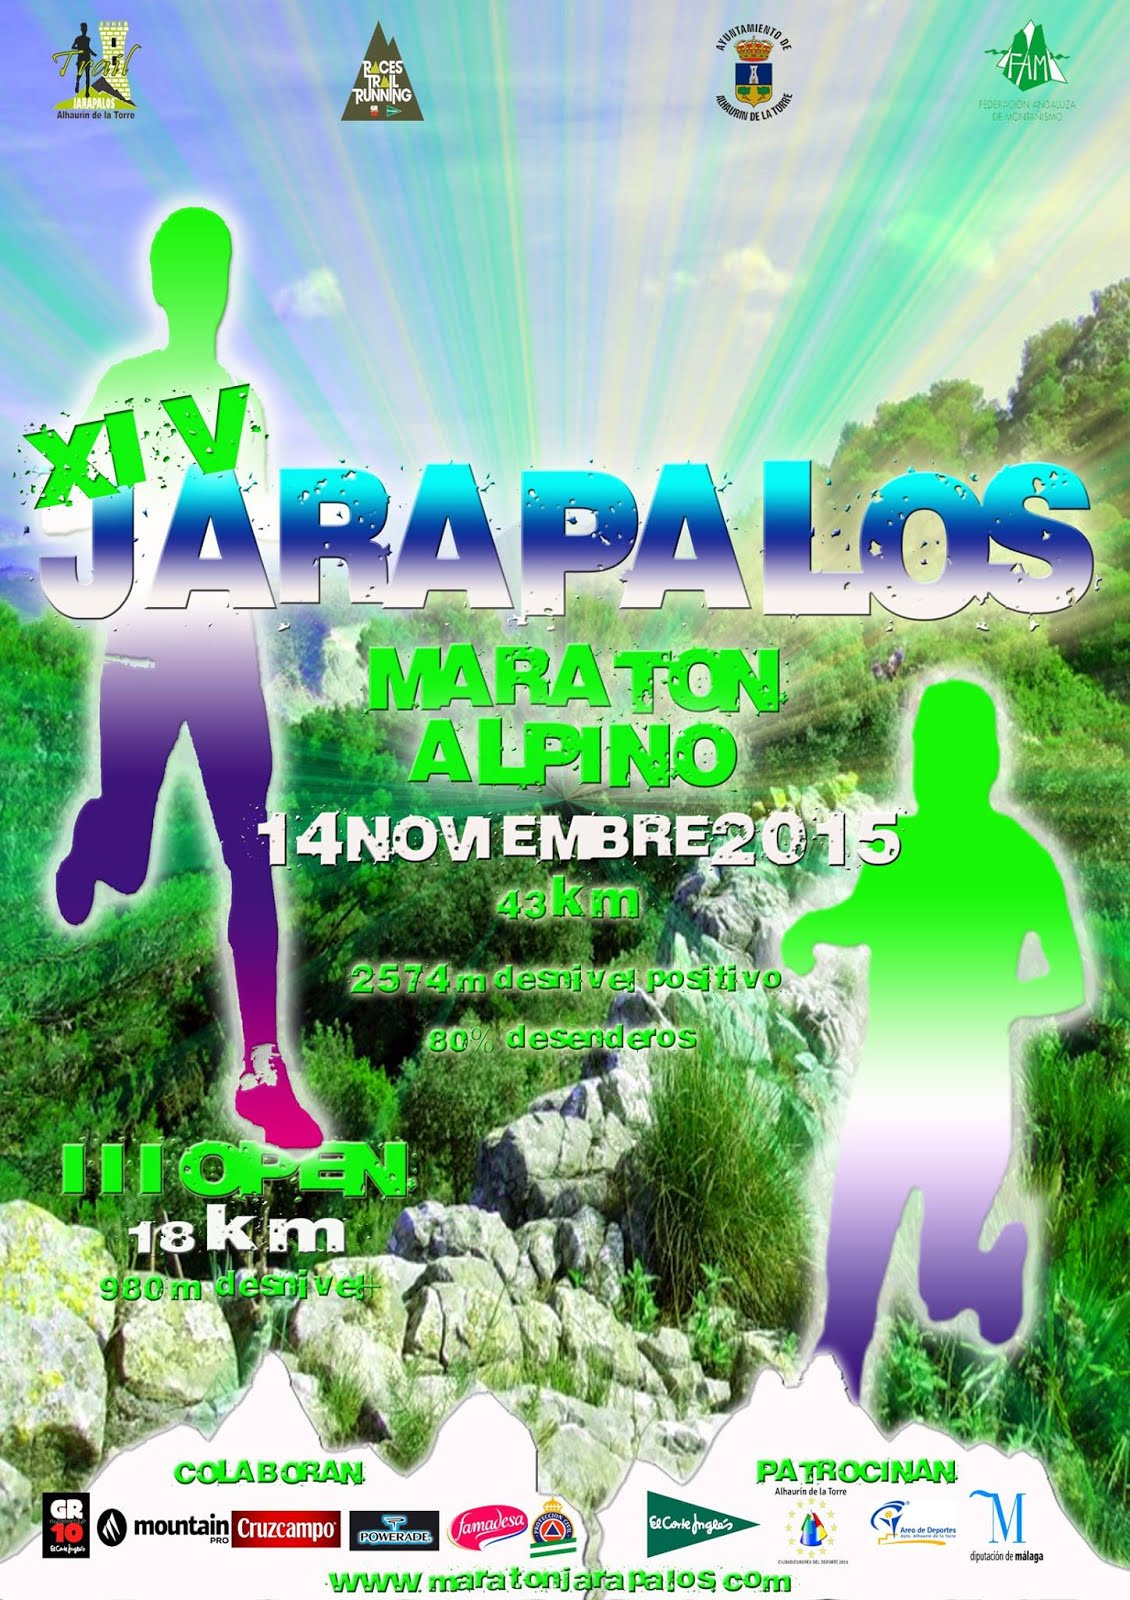 Maratón Alpino Jarapalos